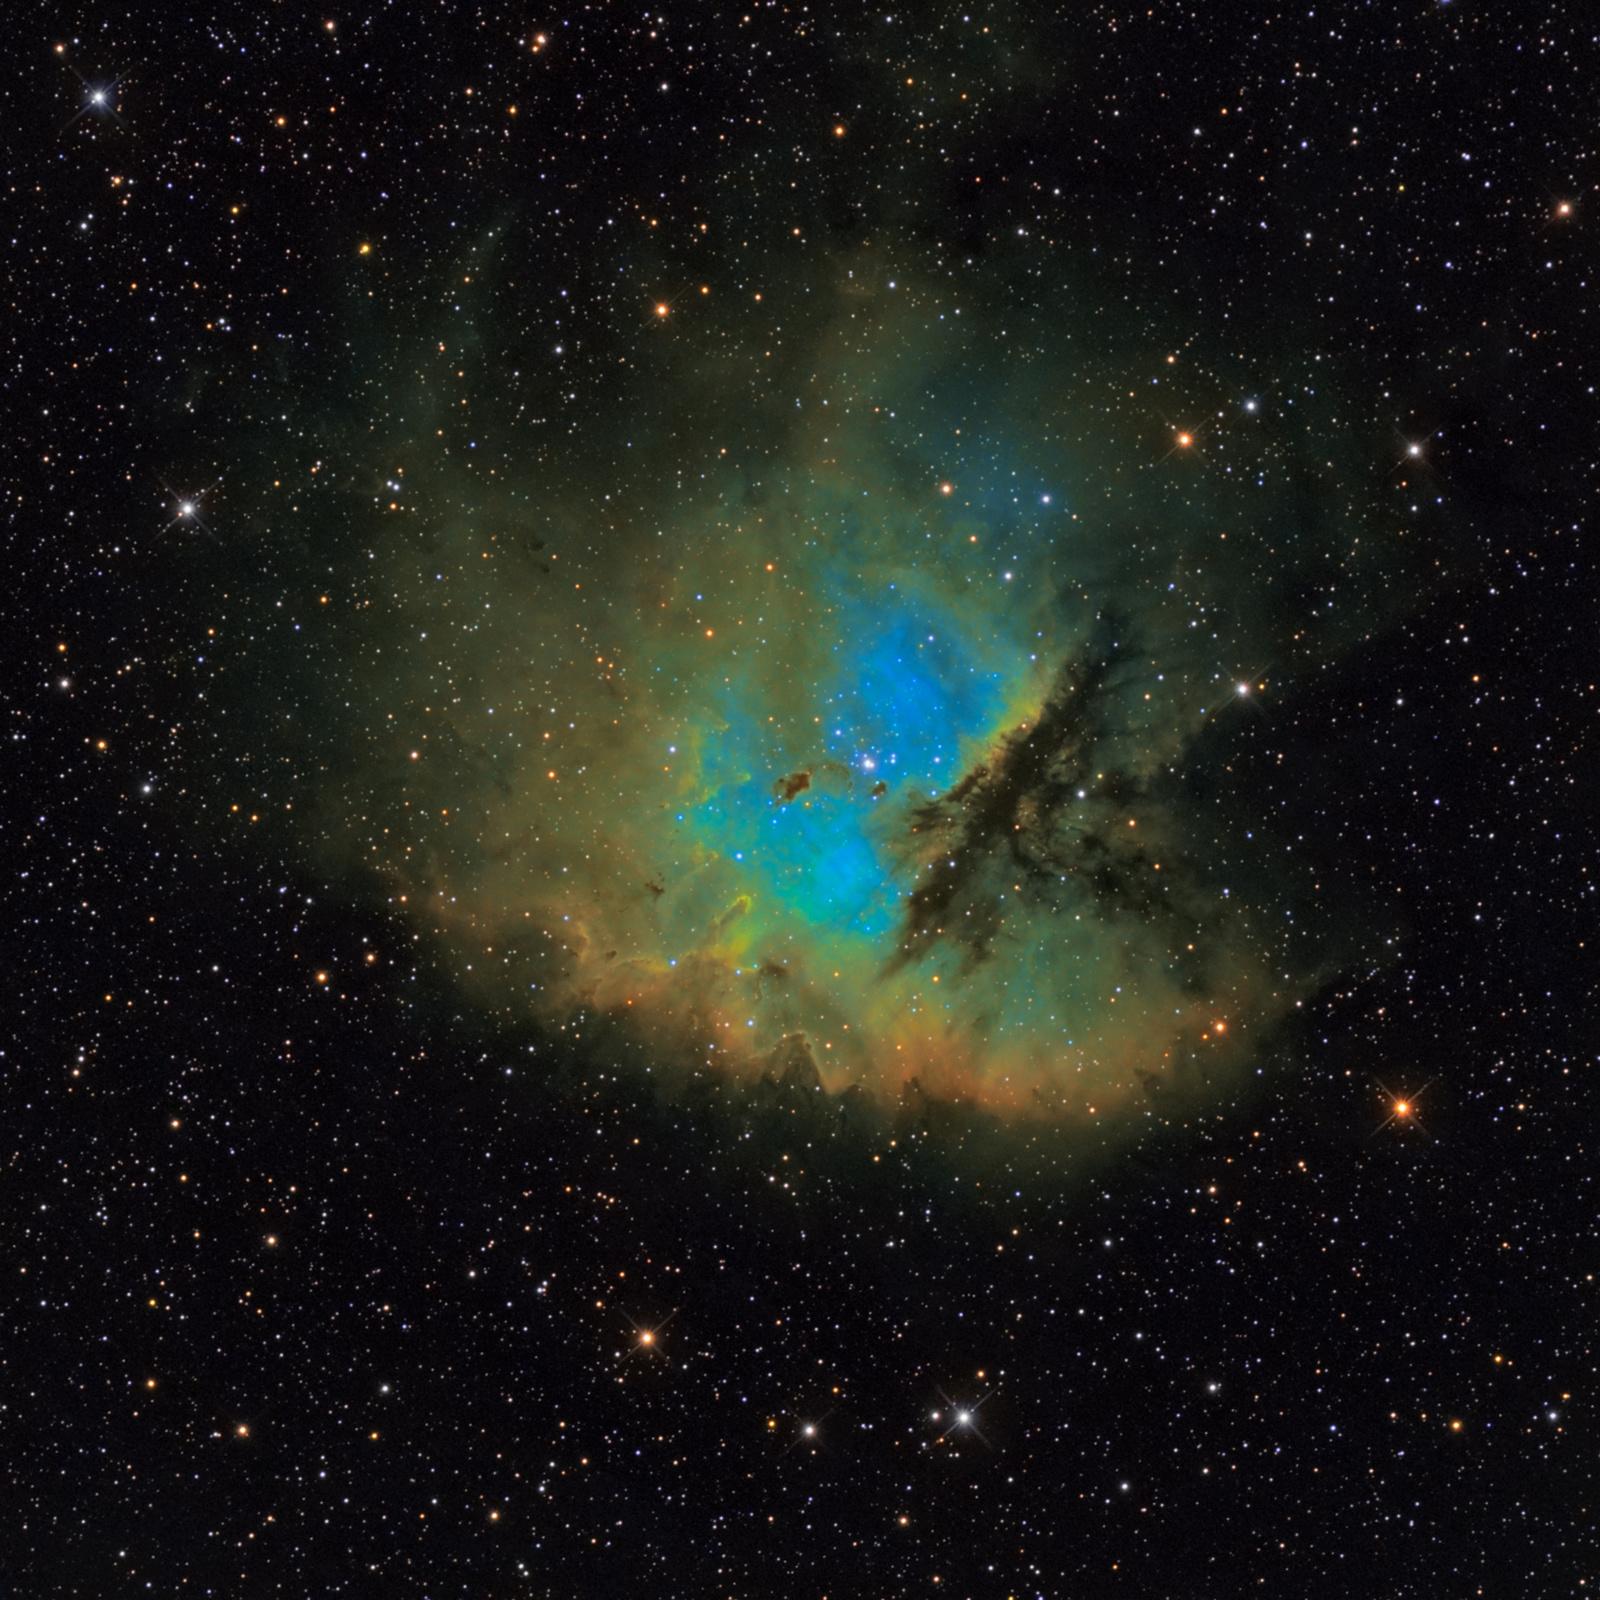 NGC281_SHO_3_2_fl.jpg